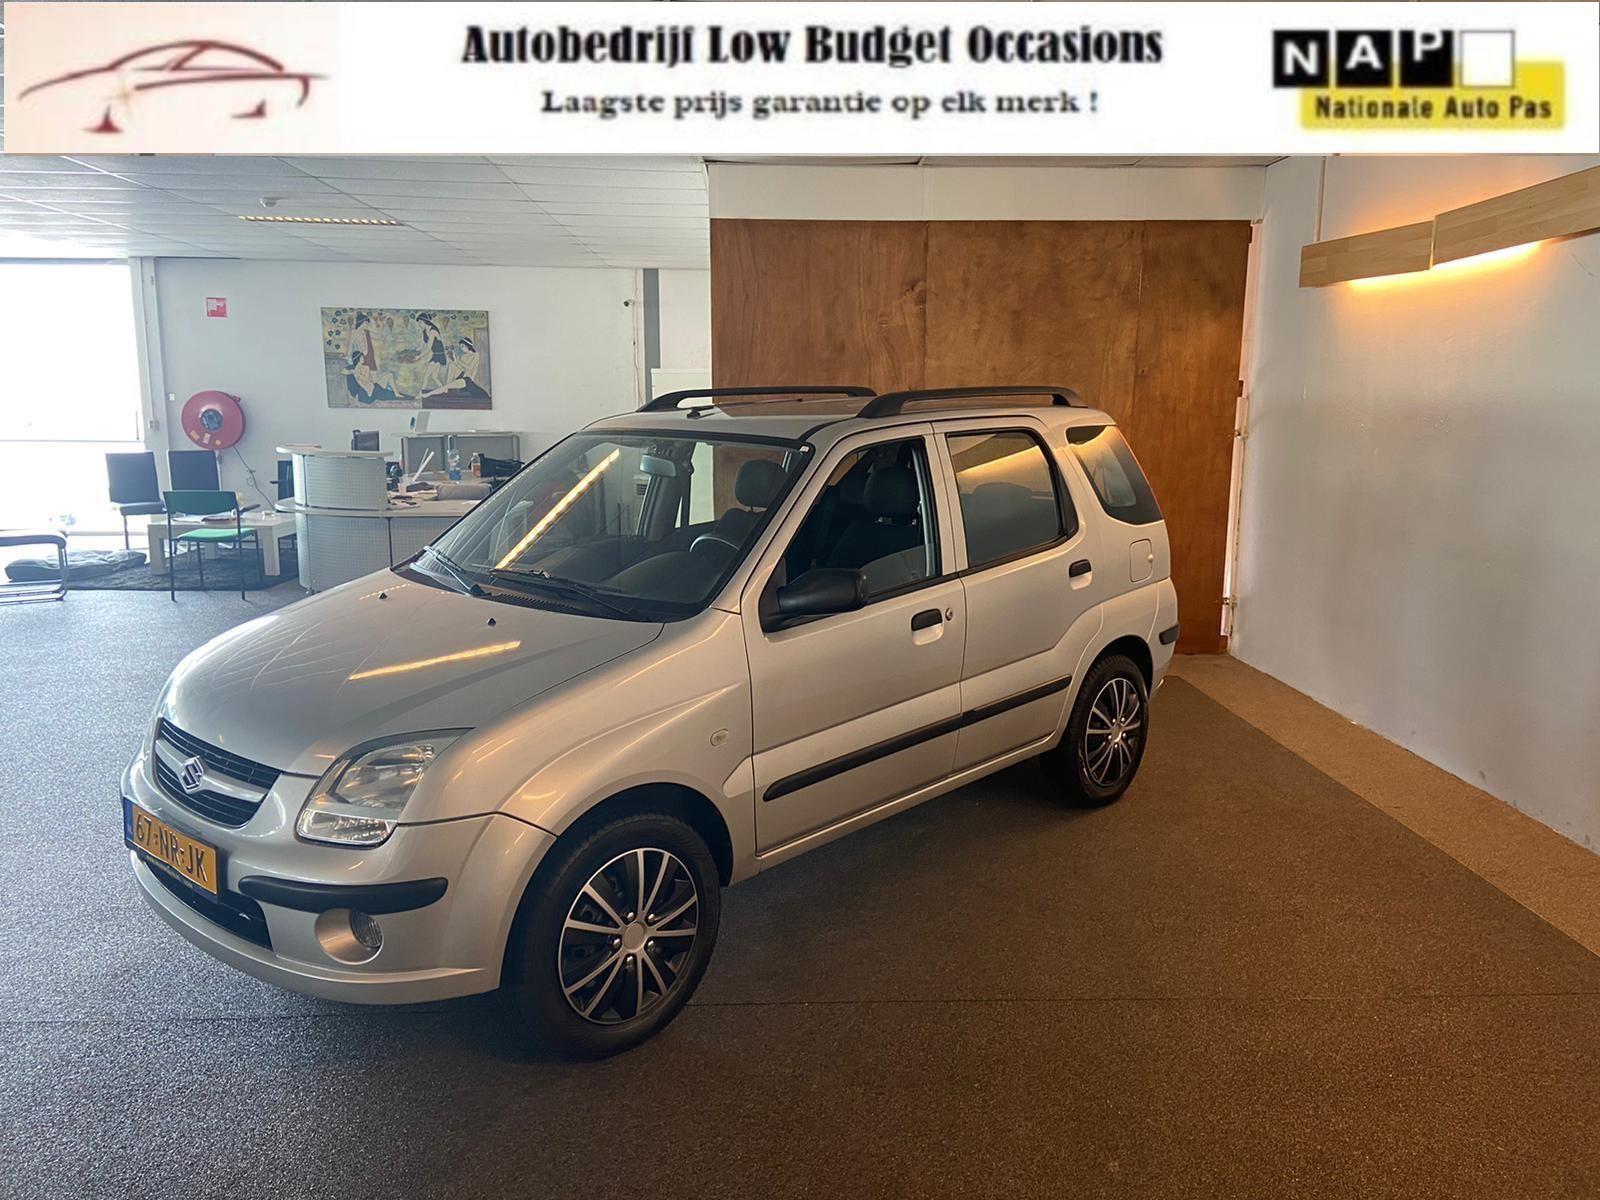 Suzuki Ignis occasion - Low Budget Occasions